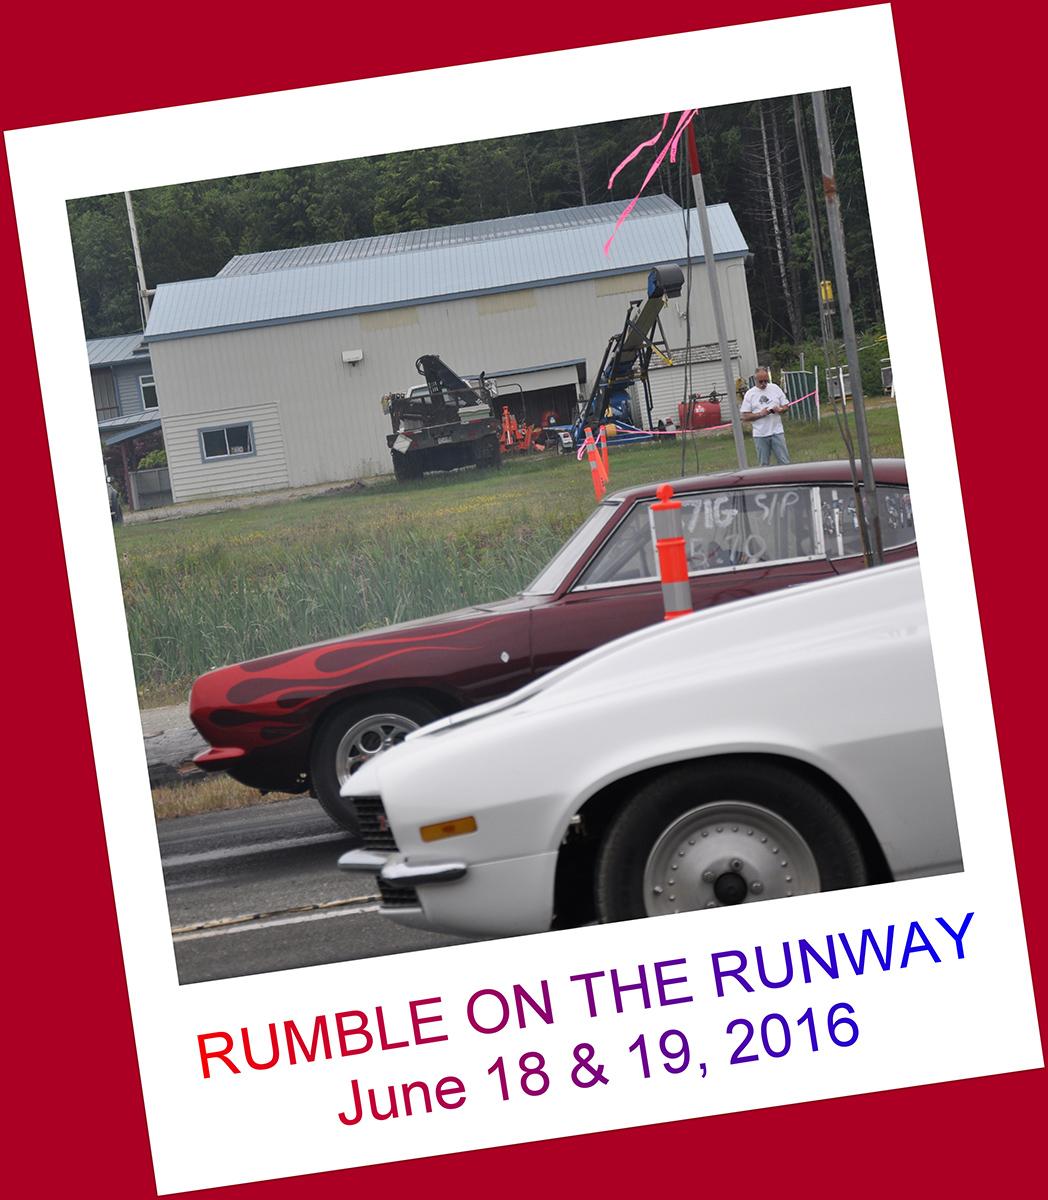 Rumble on the Runway June 18 & 19, 2016 142